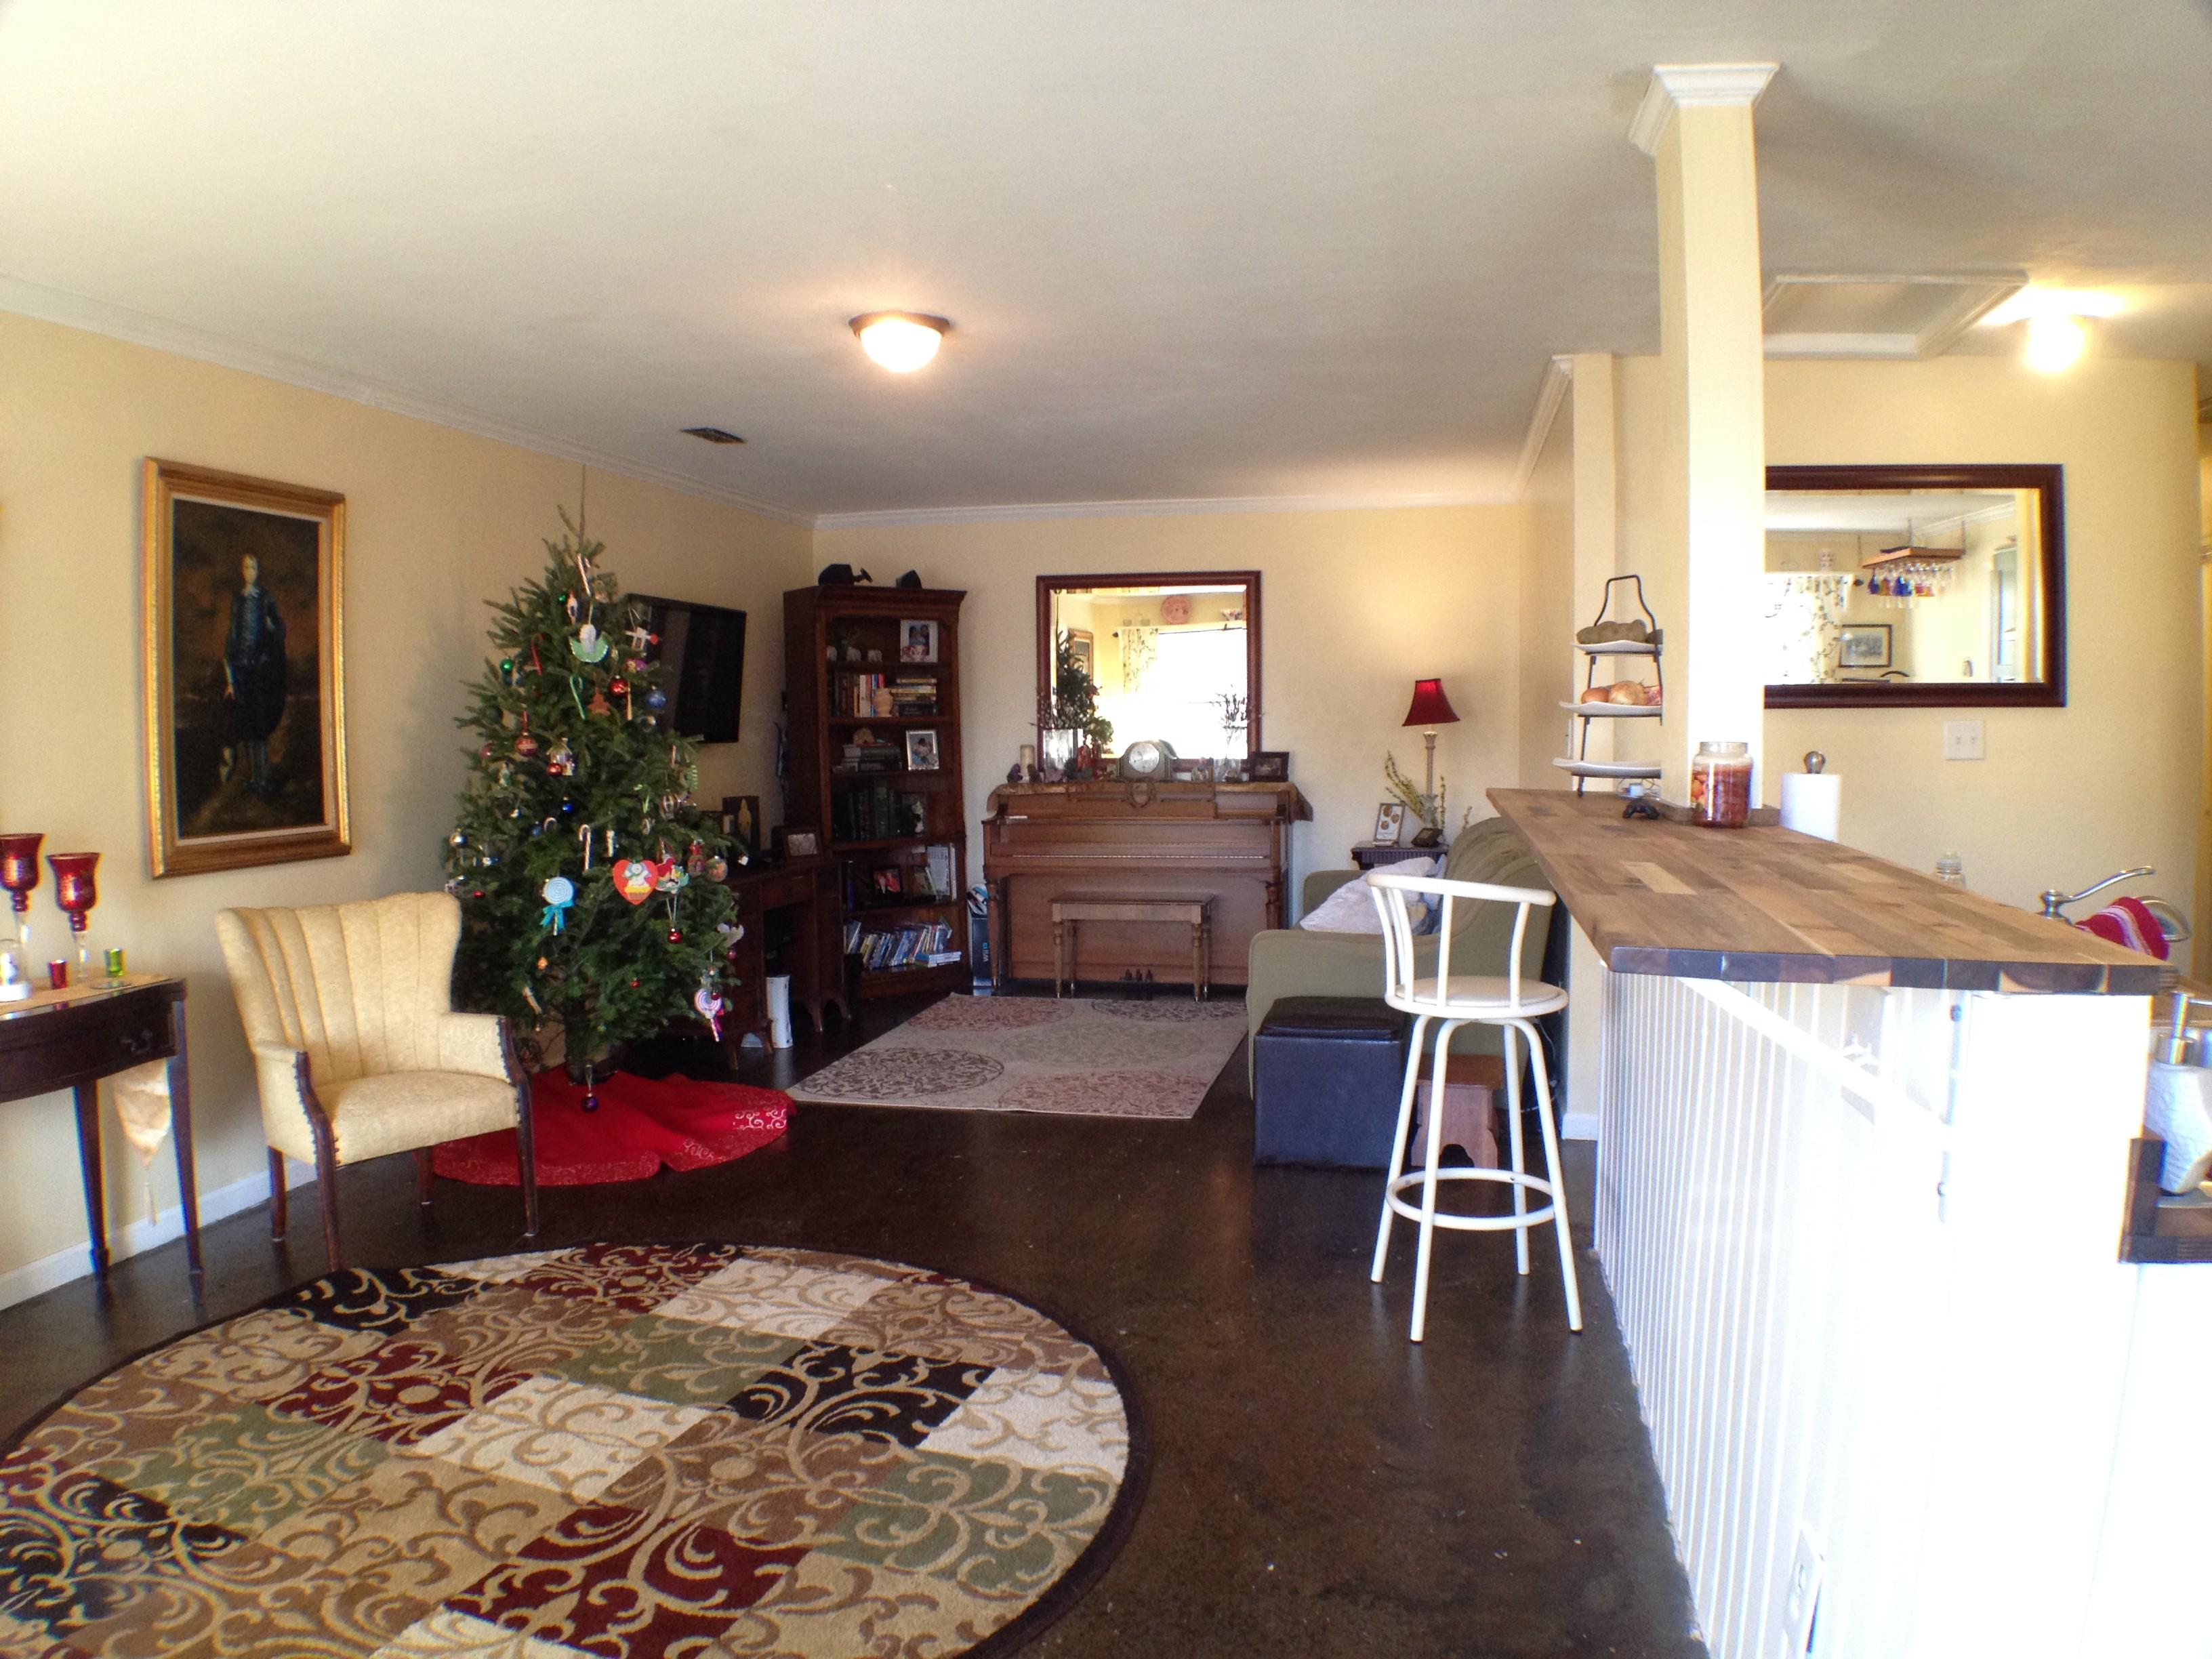 1078 thompkins ln virginia beach va 23464 3 bedroom apartment for